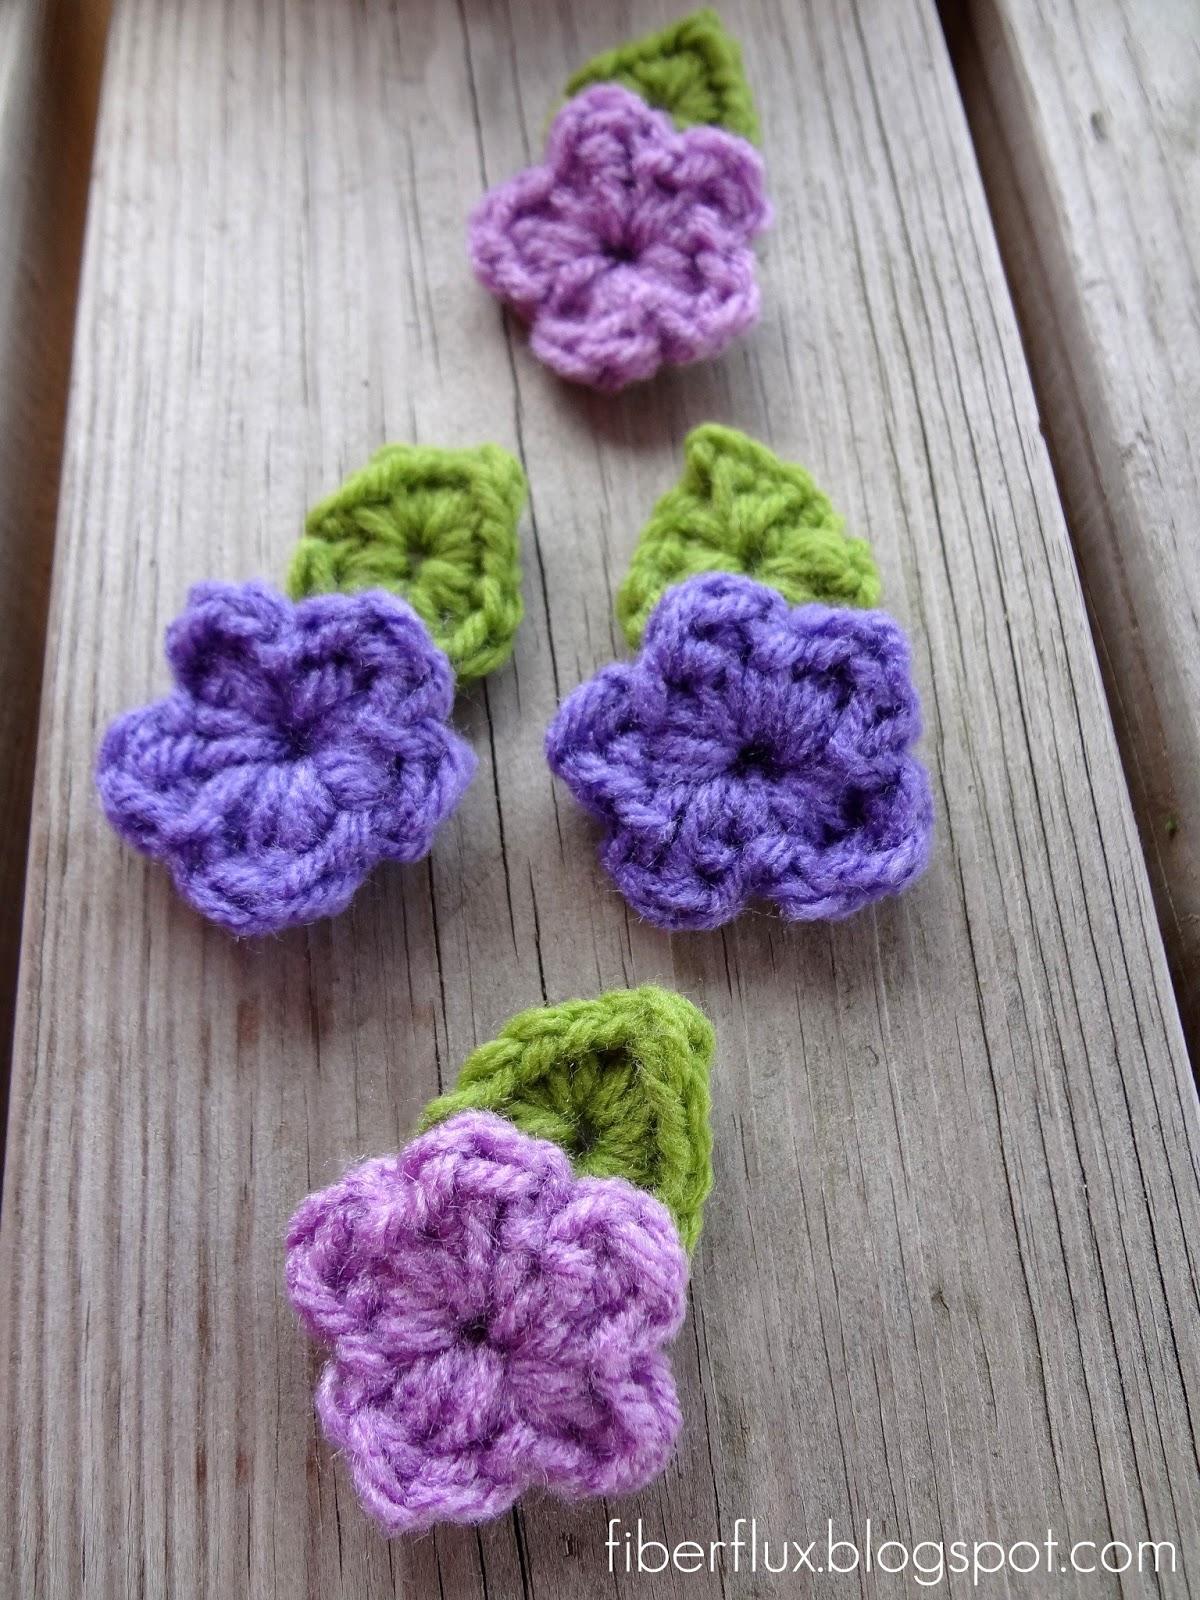 Free Crochet Flower Patterns With Stems : Fiber Flux: Free Crochet Pattern...One Round Leaf (With Stem)